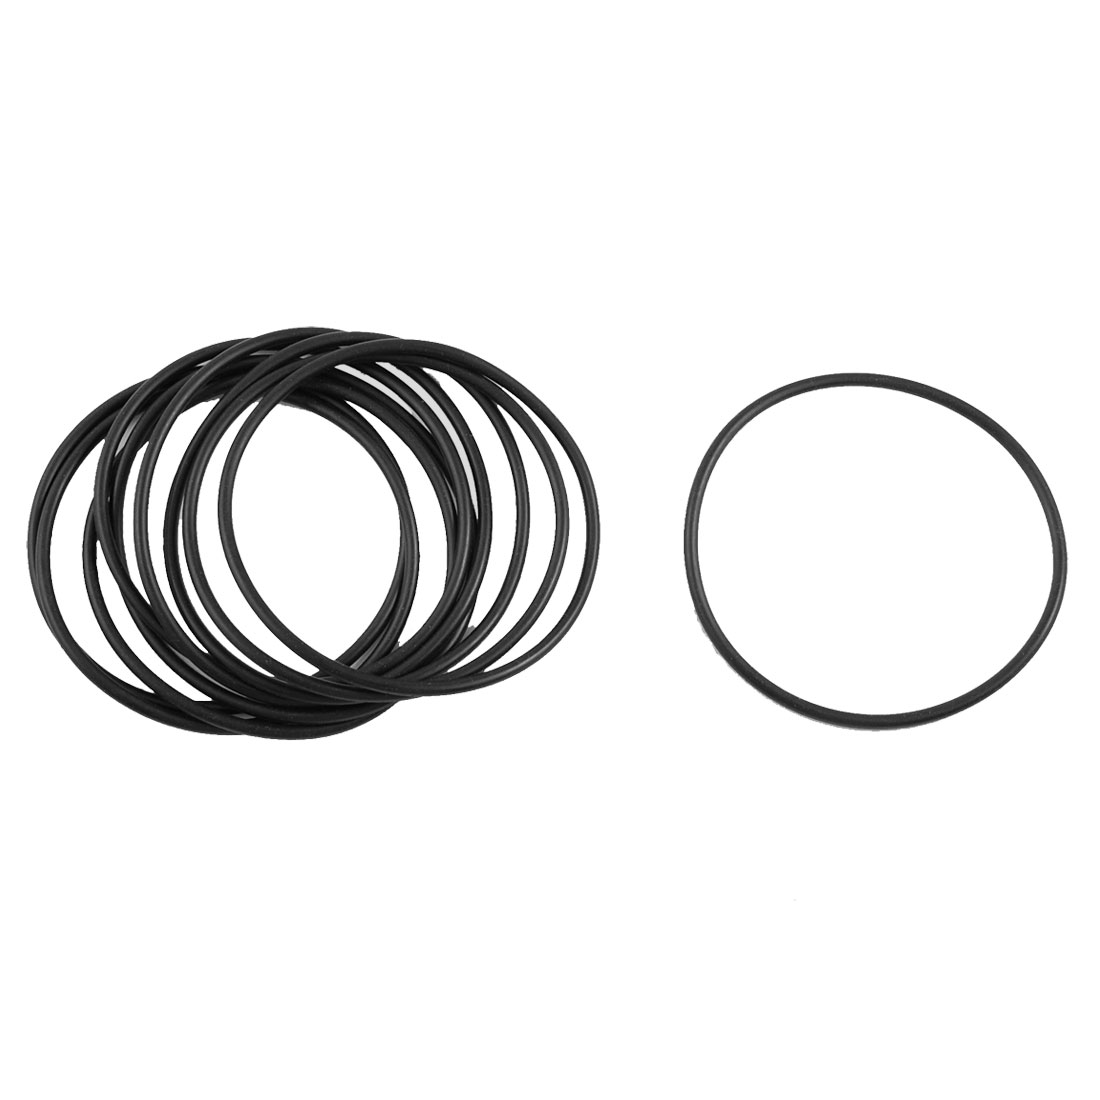 105 x 2.5mm Nitrile 70 O/'Ring 10x